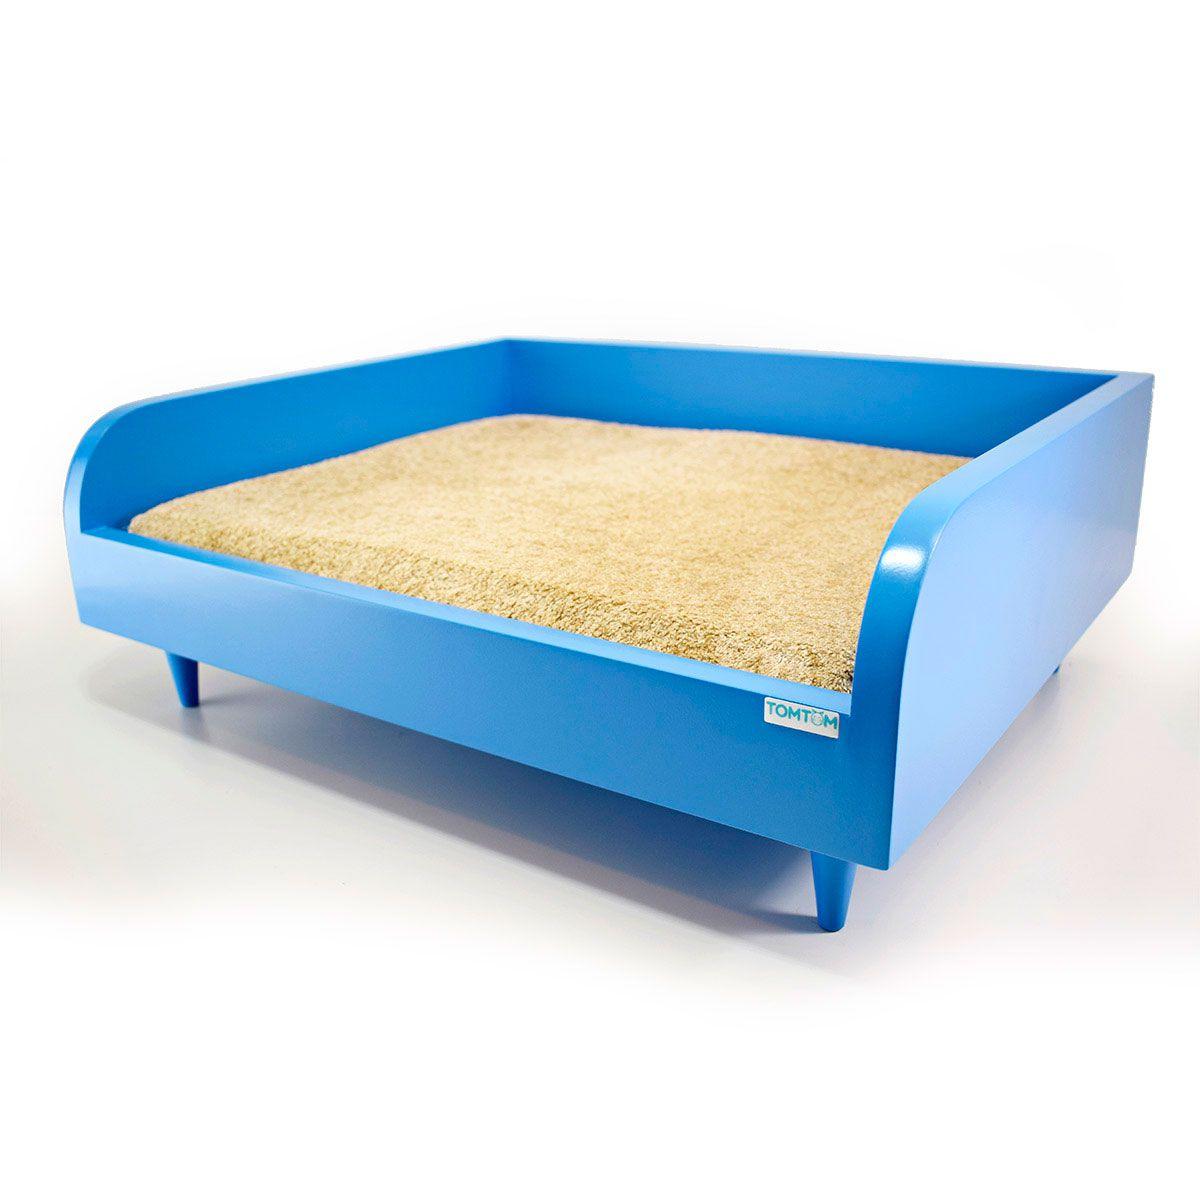 Sofa Camas Html on sofa designs, sofa blanco, sofa wood, sofa covers, sofa couches, sofa beds, sofa chair, sofa de dois foto, sofa in-house, sofa styles, sofa legs, sofa car, sofa mart, sofa love, sofa china, sofa azul,